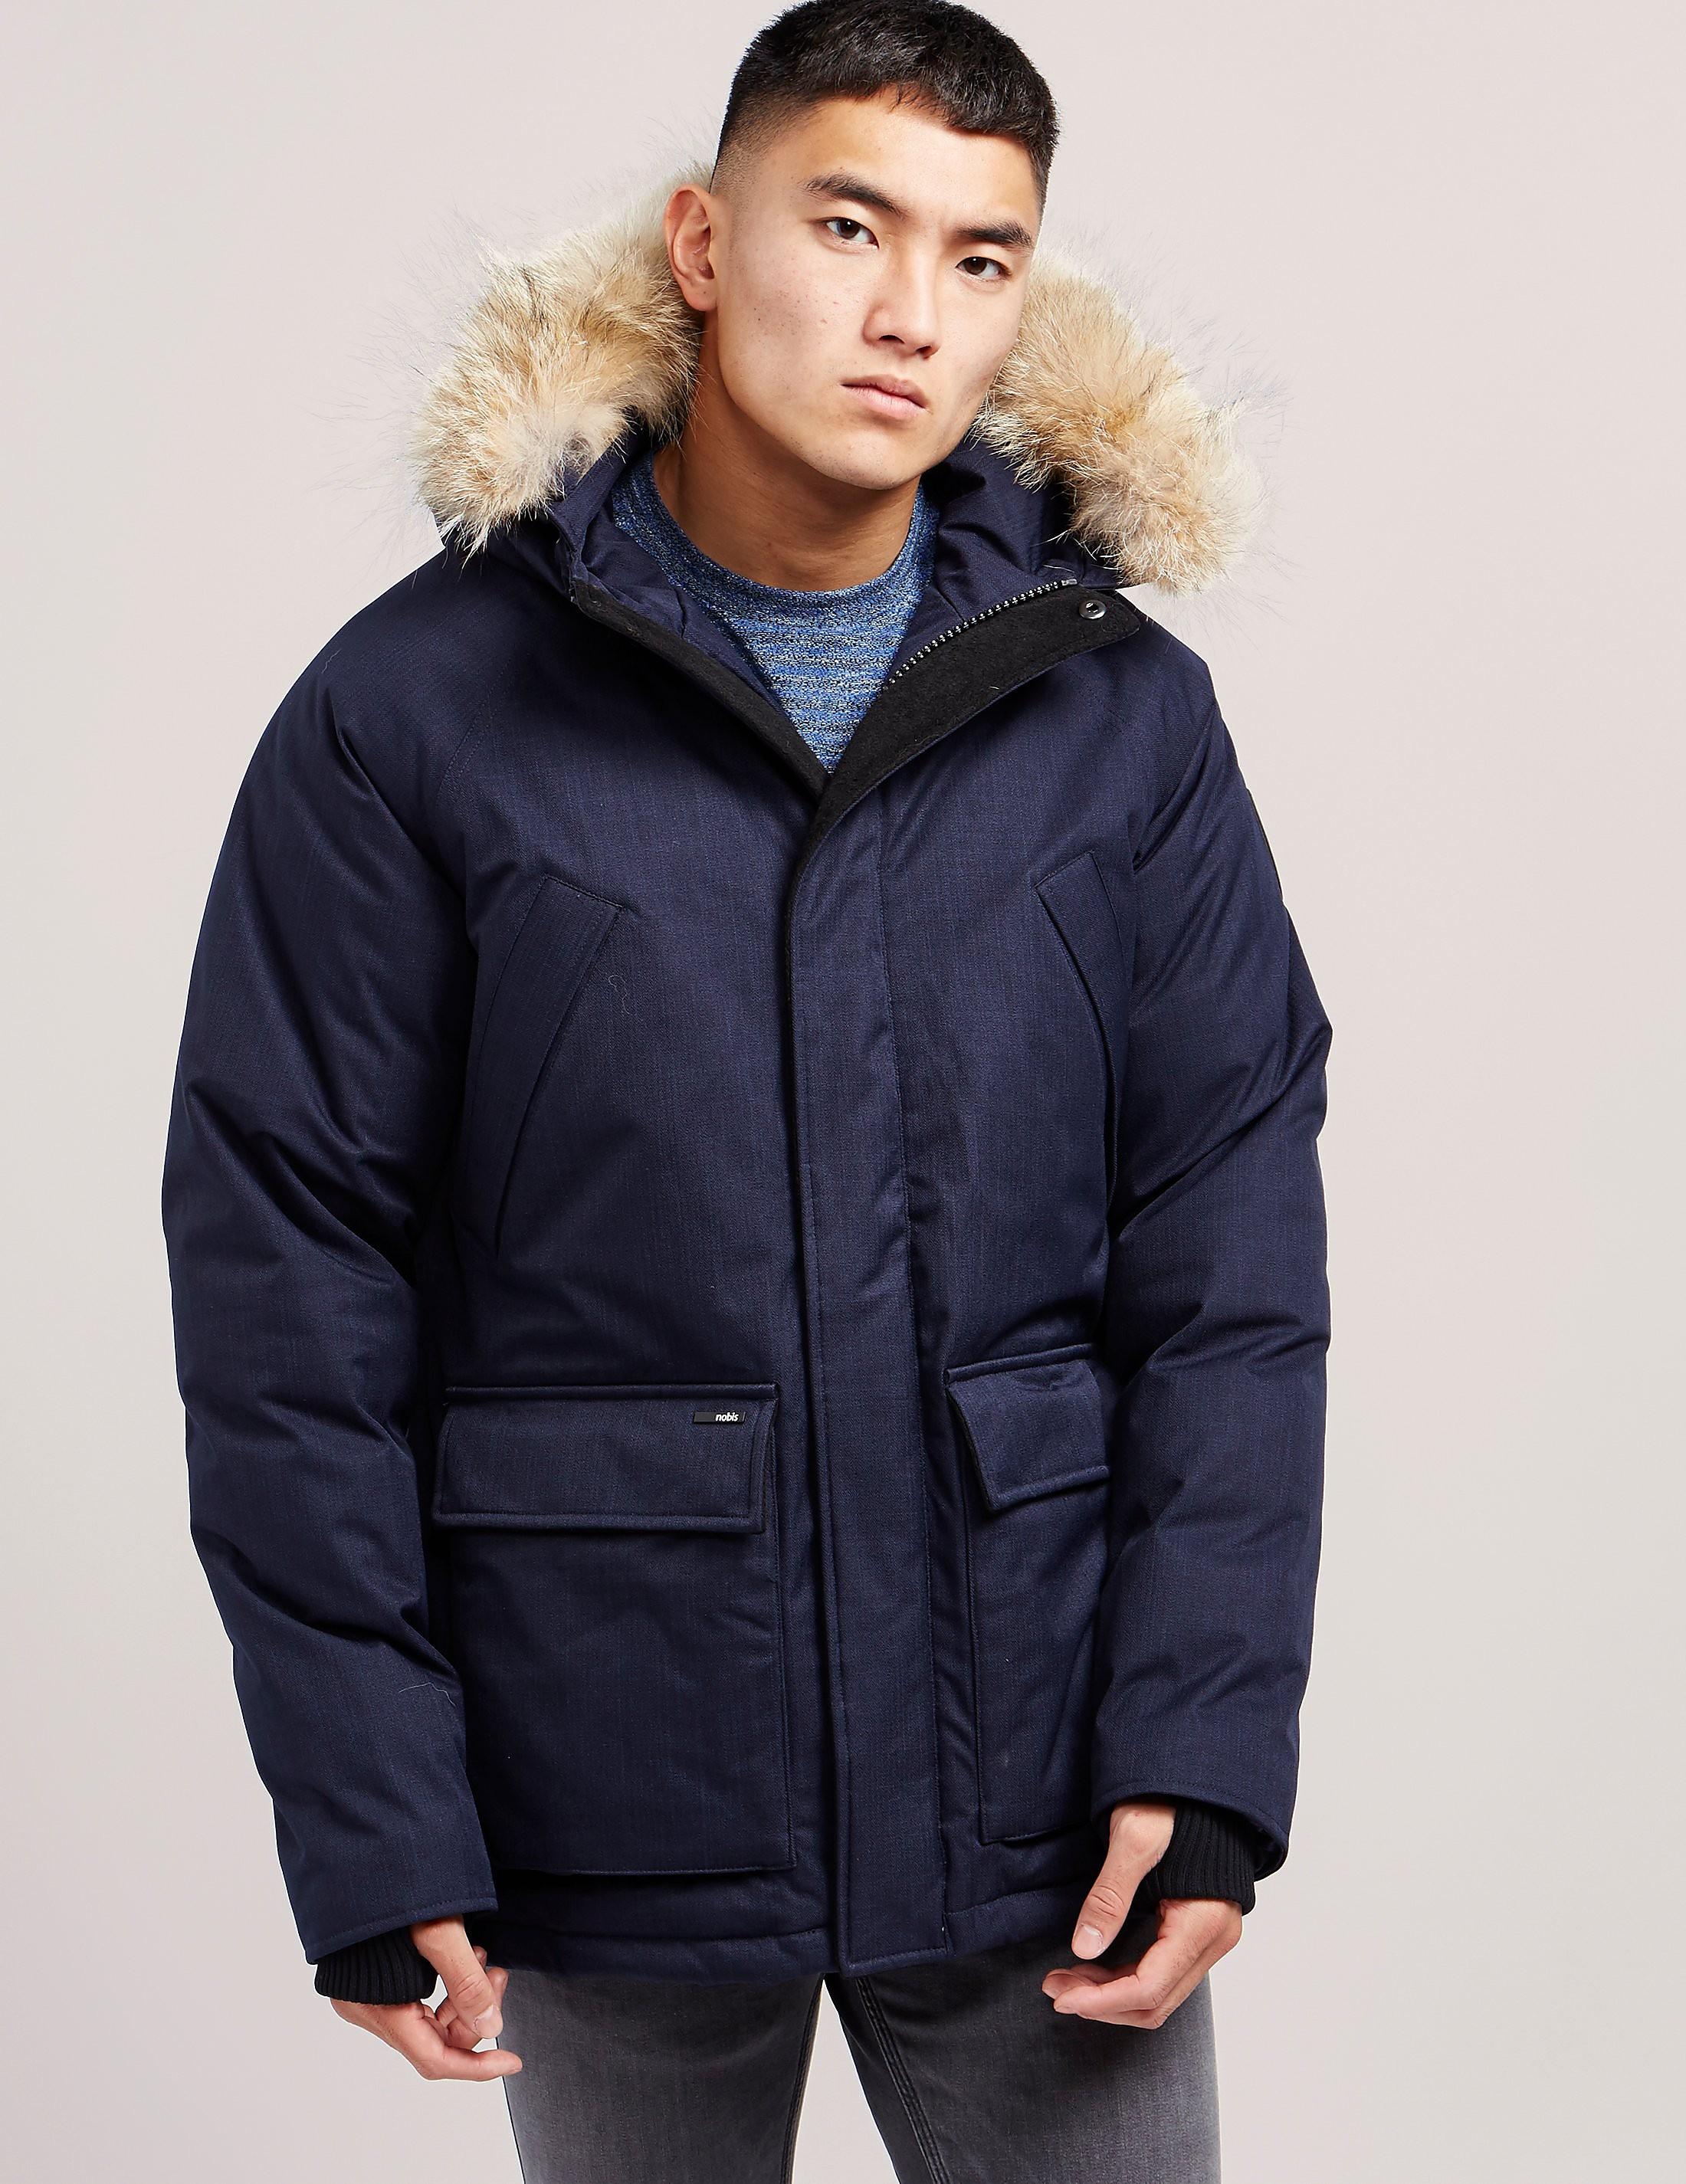 Nobis Heritage Padded Jacket